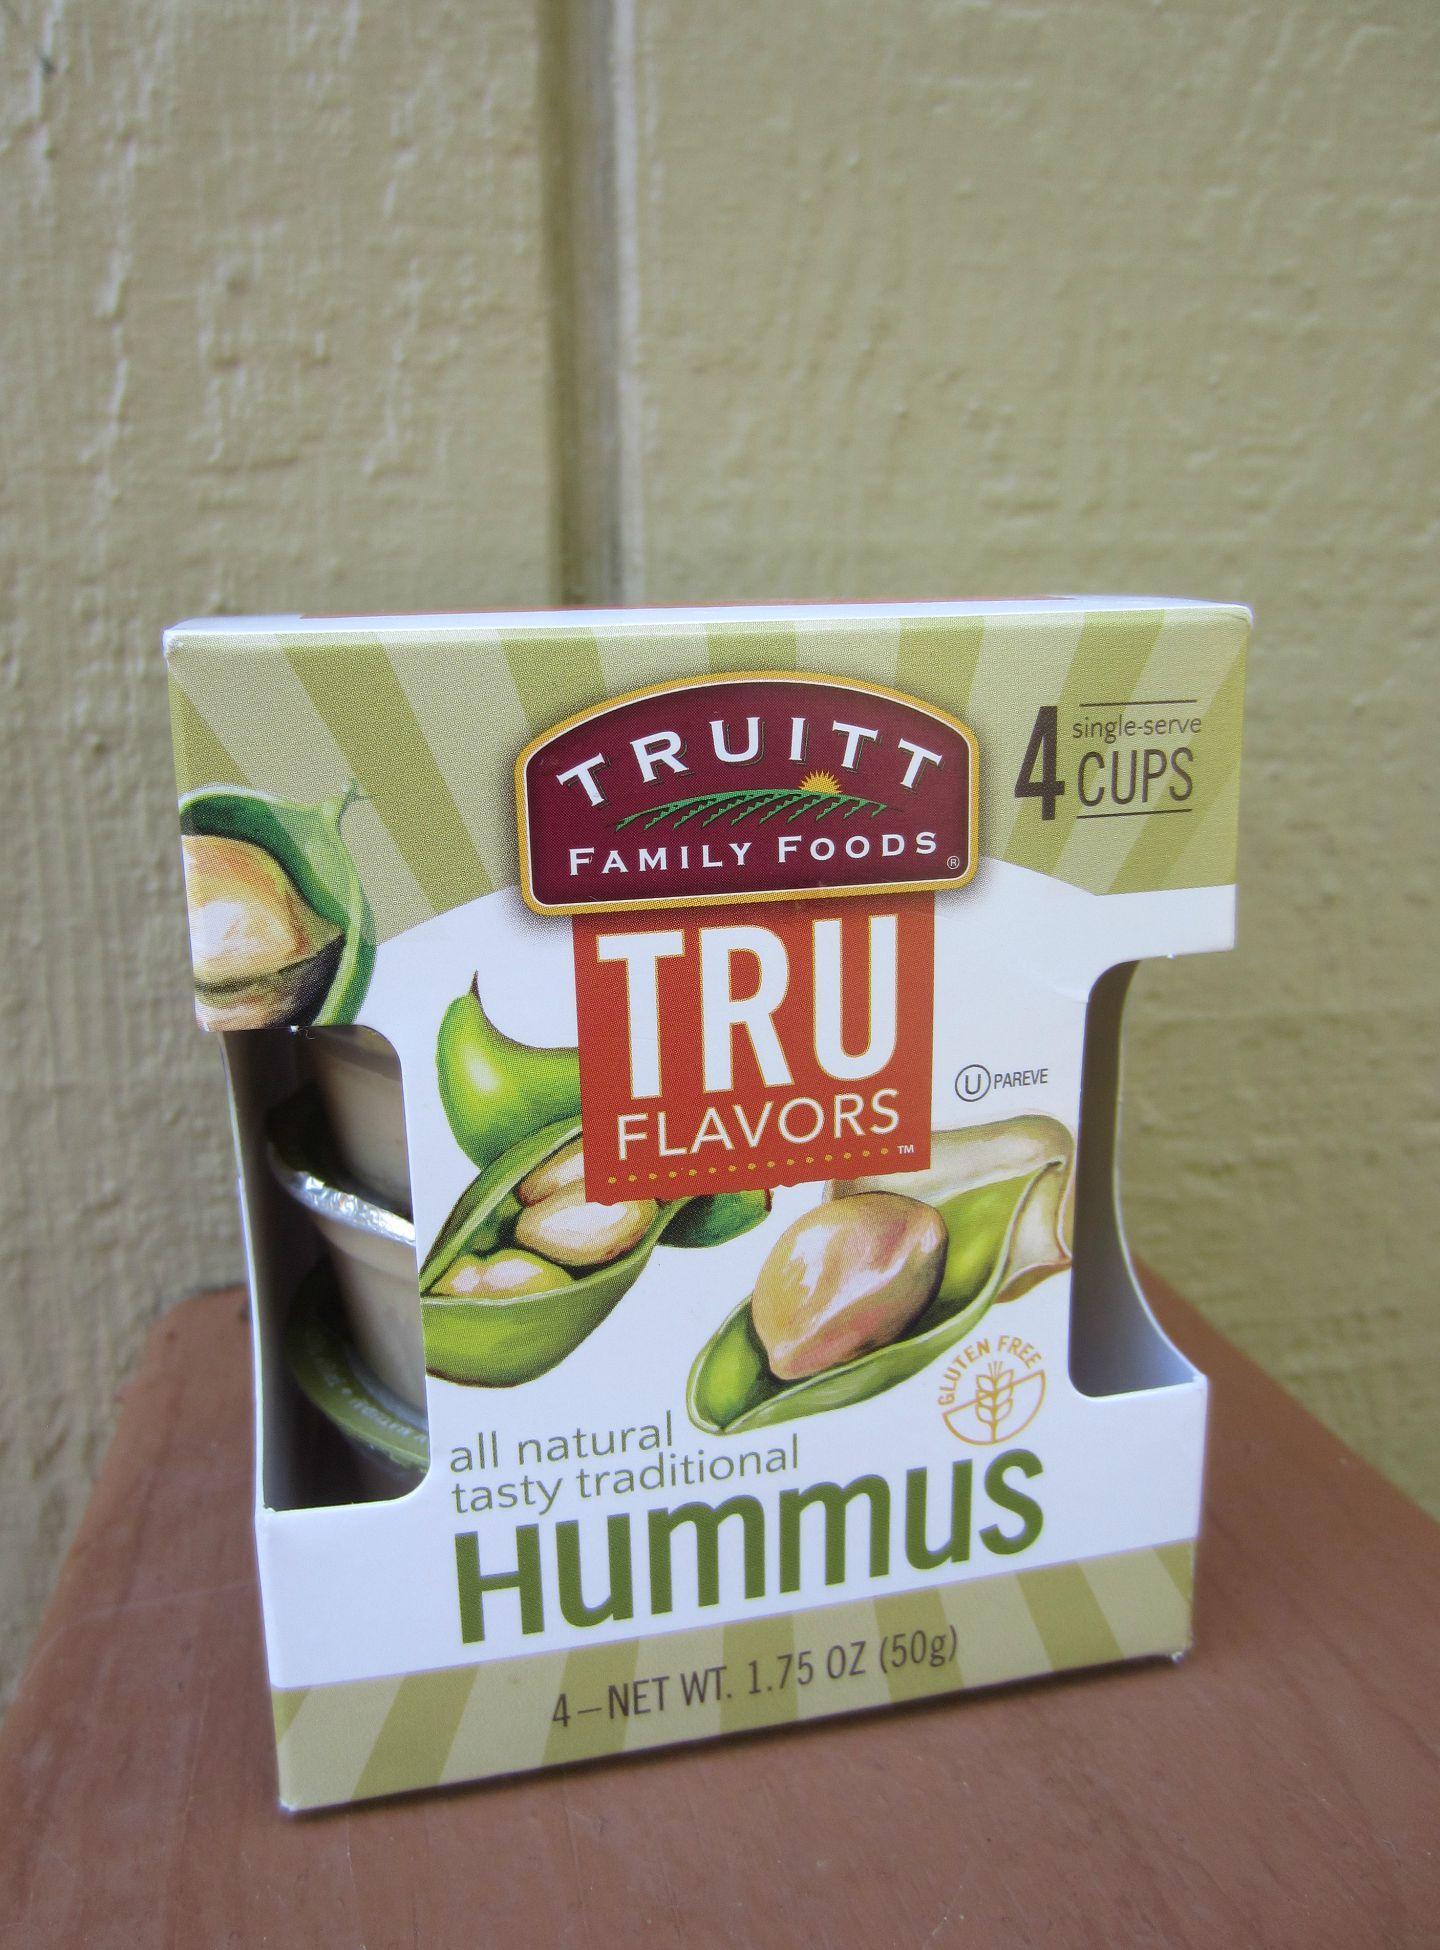 Truitt tru flavors hummus to go packs